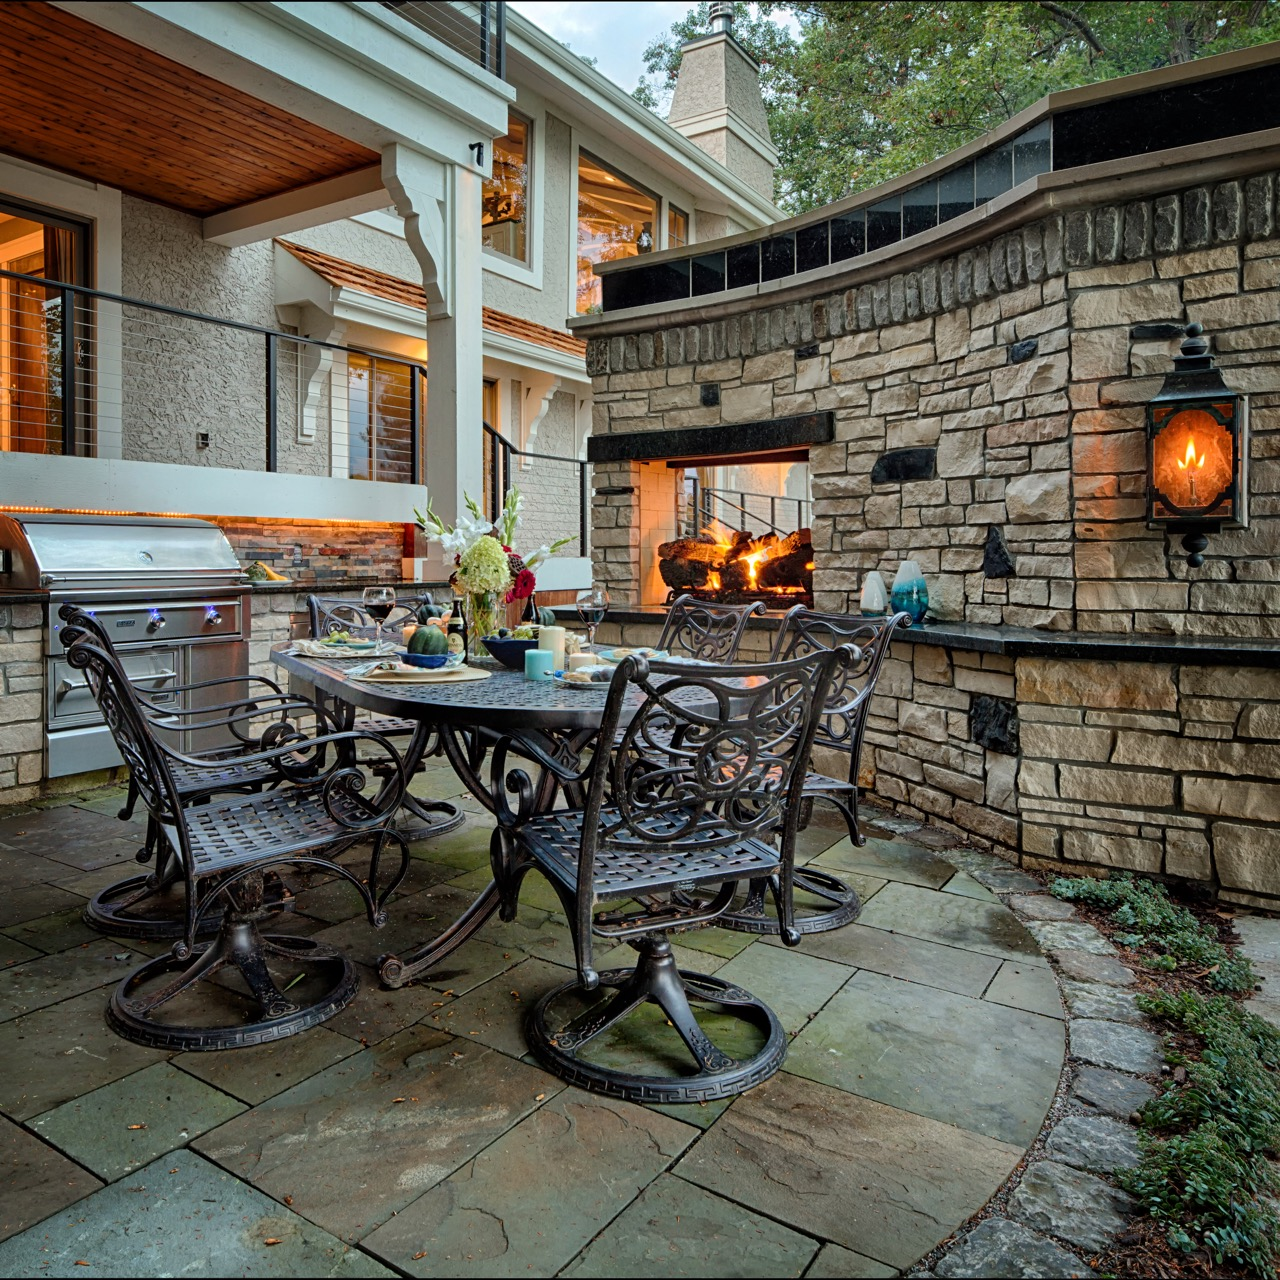 Mom's Design Build - Natural Gas Fireplace Backyard Kitchen